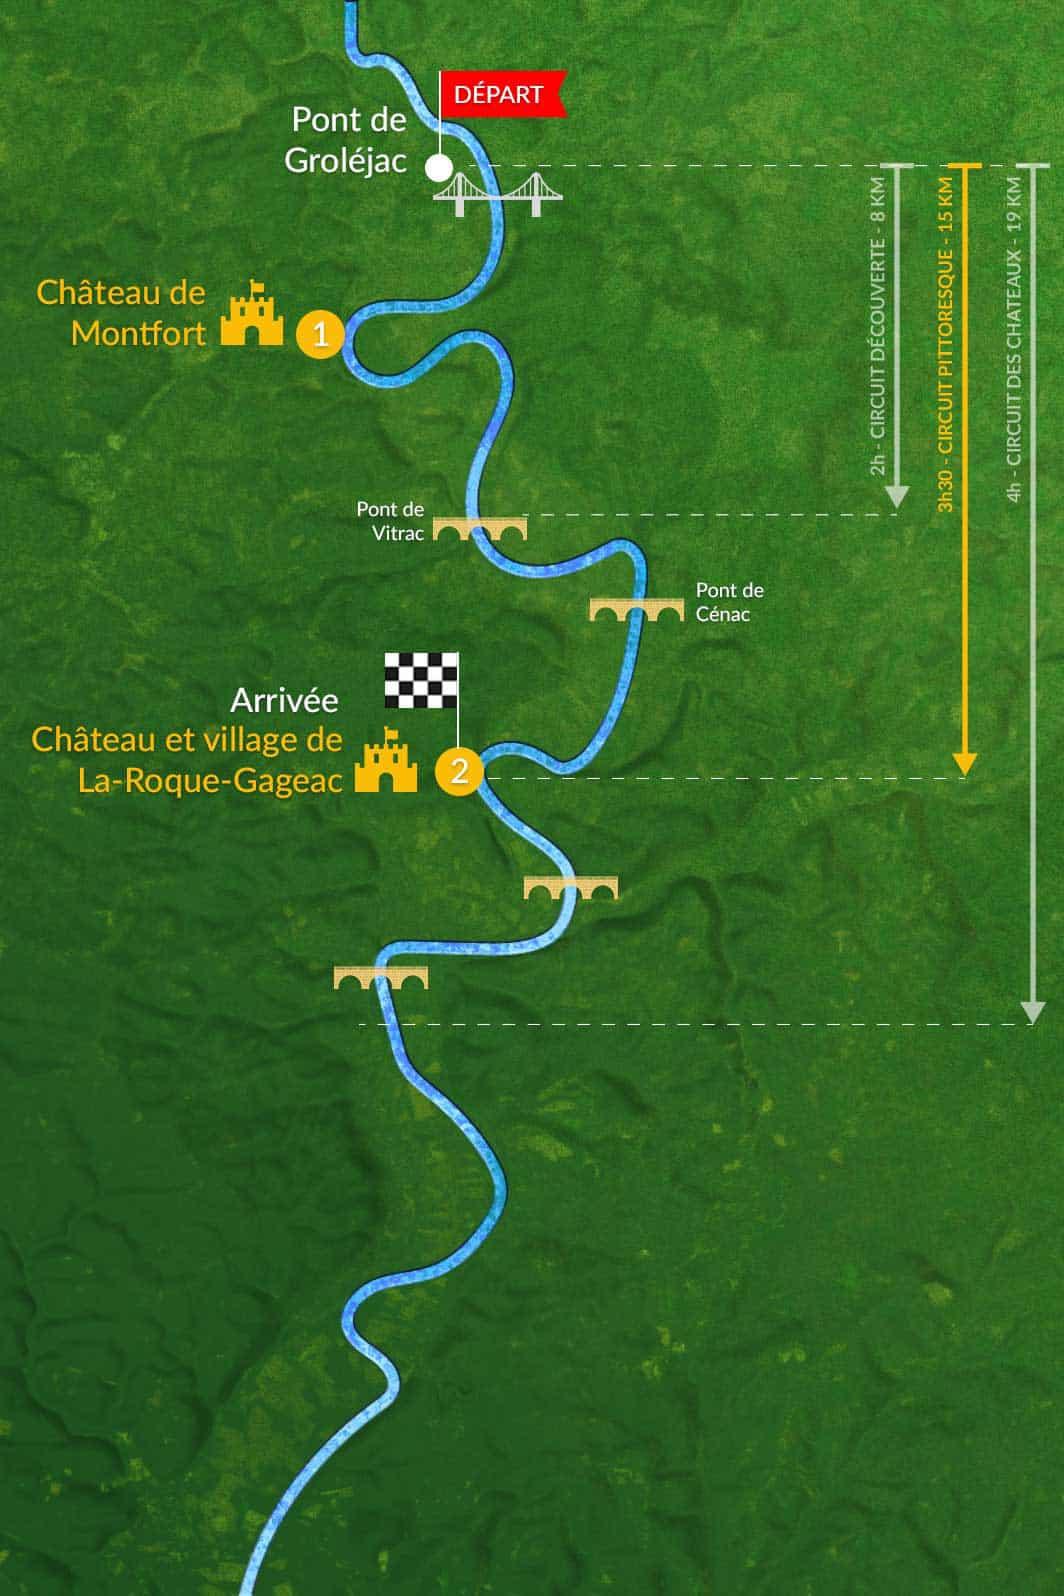 Circuit Pittoresque parcours canoe dordogne